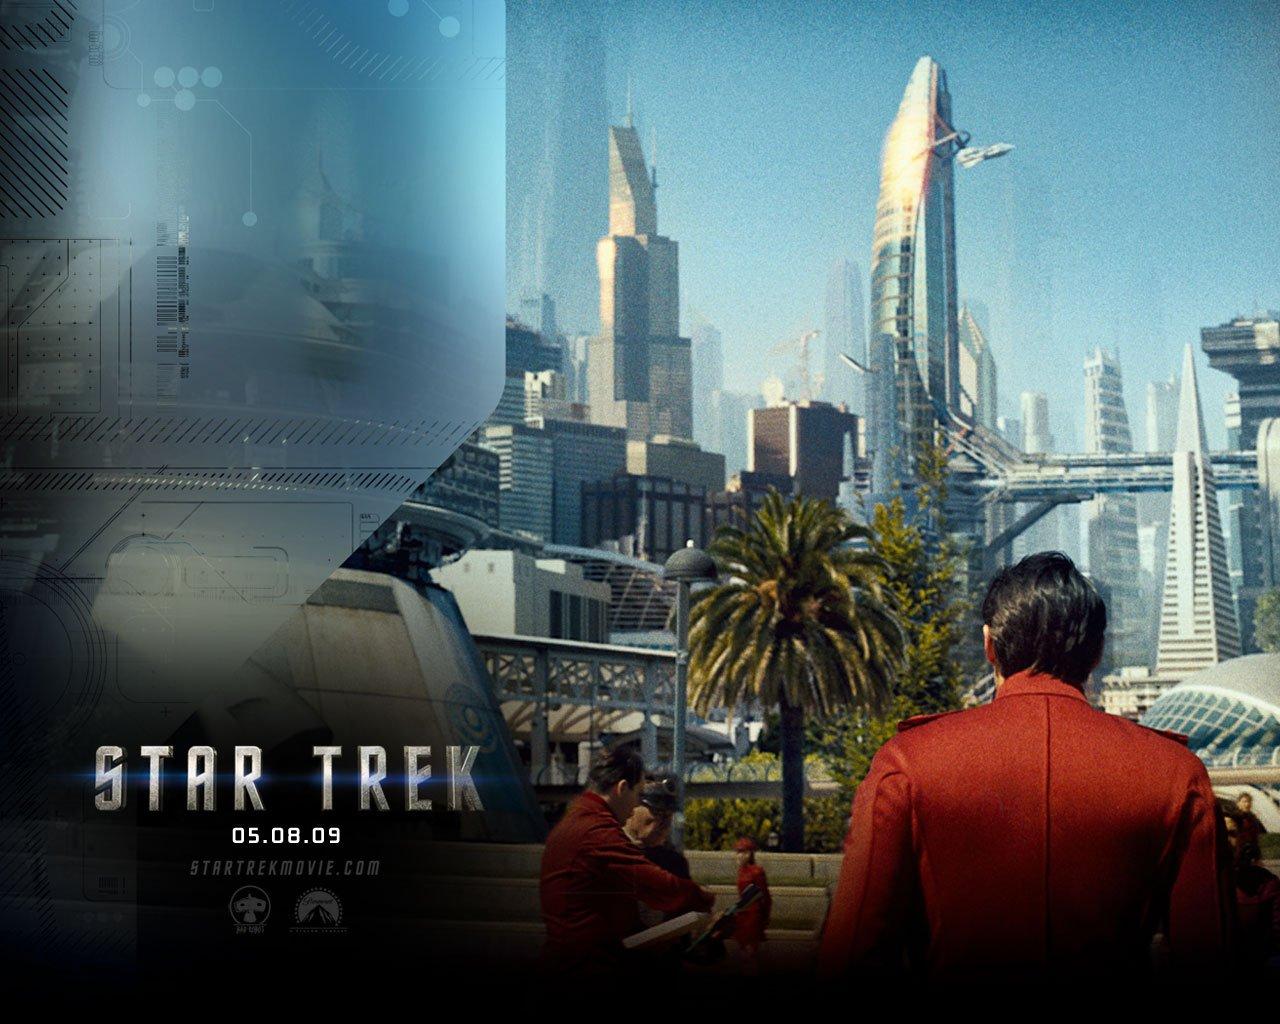 Star Trek 2009 wallpaper   FreeMovieWallpapersorg 1280x1024